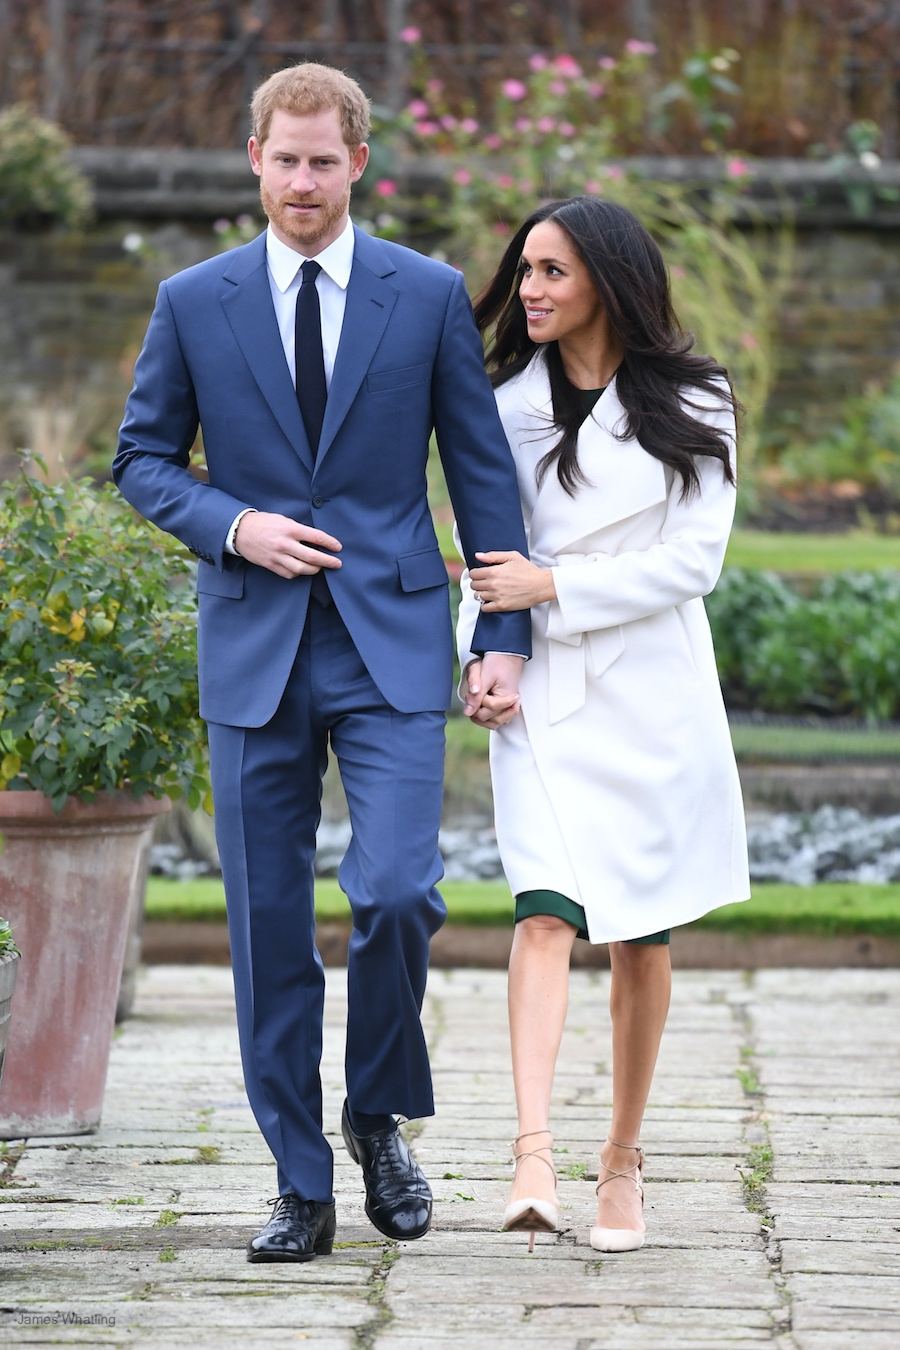 Meghan Markle's engagement annoucement outfit